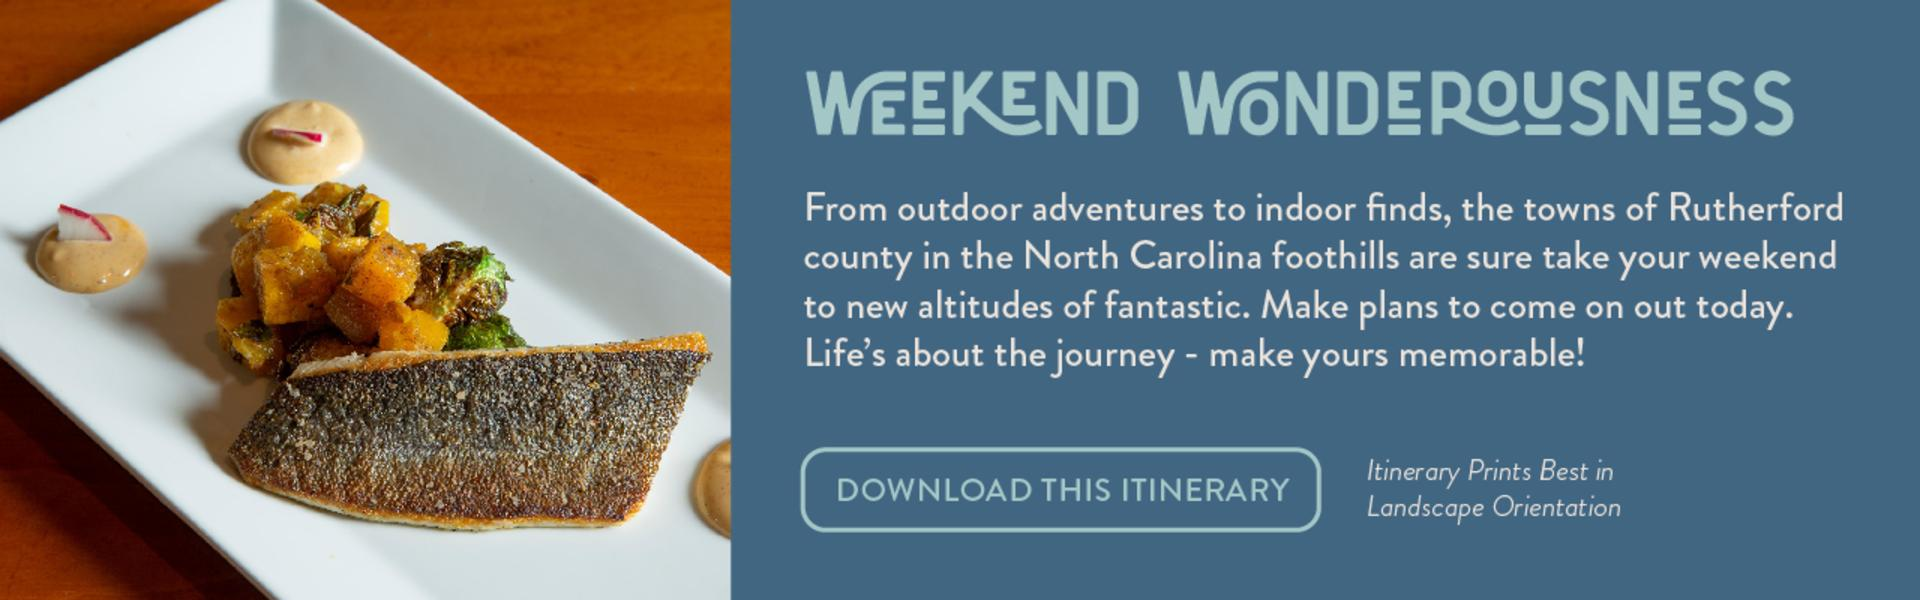 Weekend Wonderousness